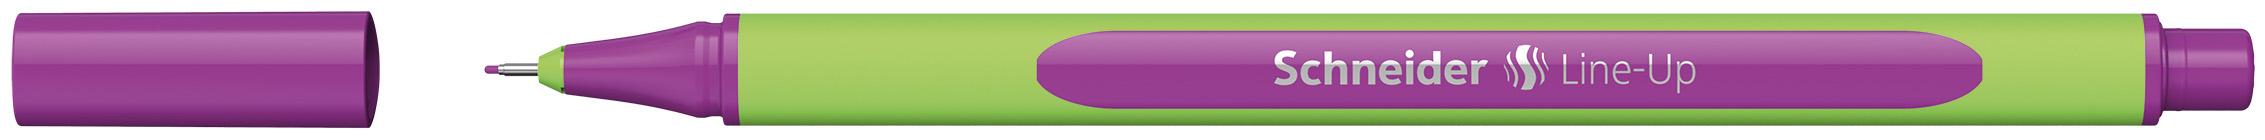 Ручка капиллярная Schneider Line-Up ярко-фиолетовая 0.4мм